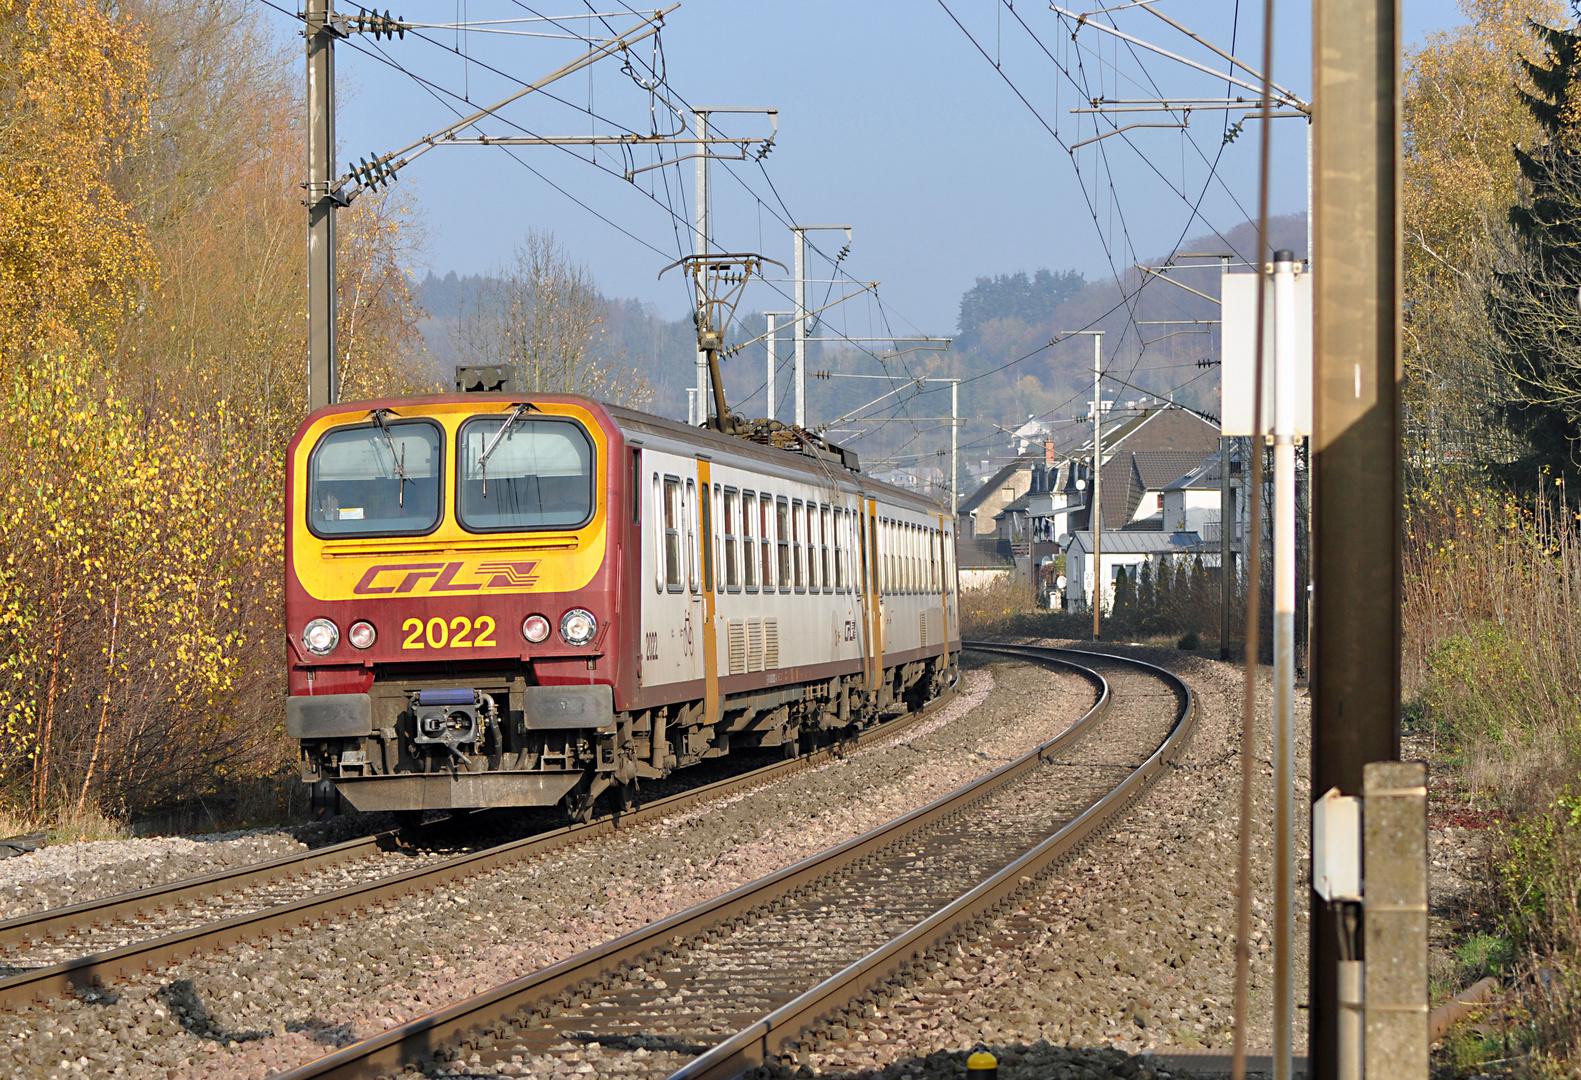 Baureihe 2000 (Z2) Part IV